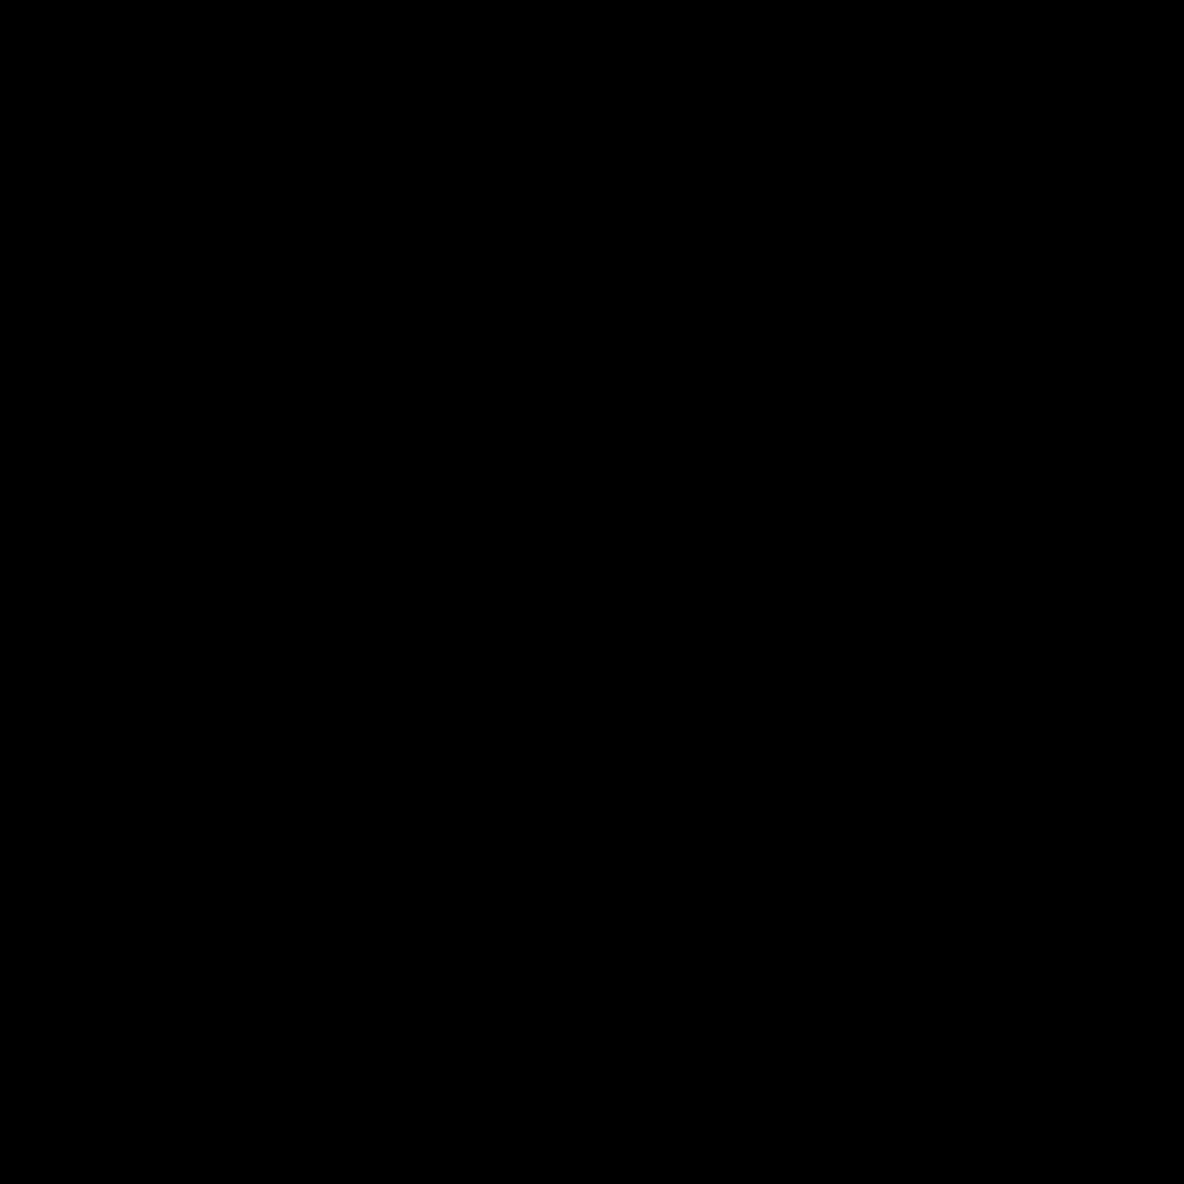 3x3 font by XArts